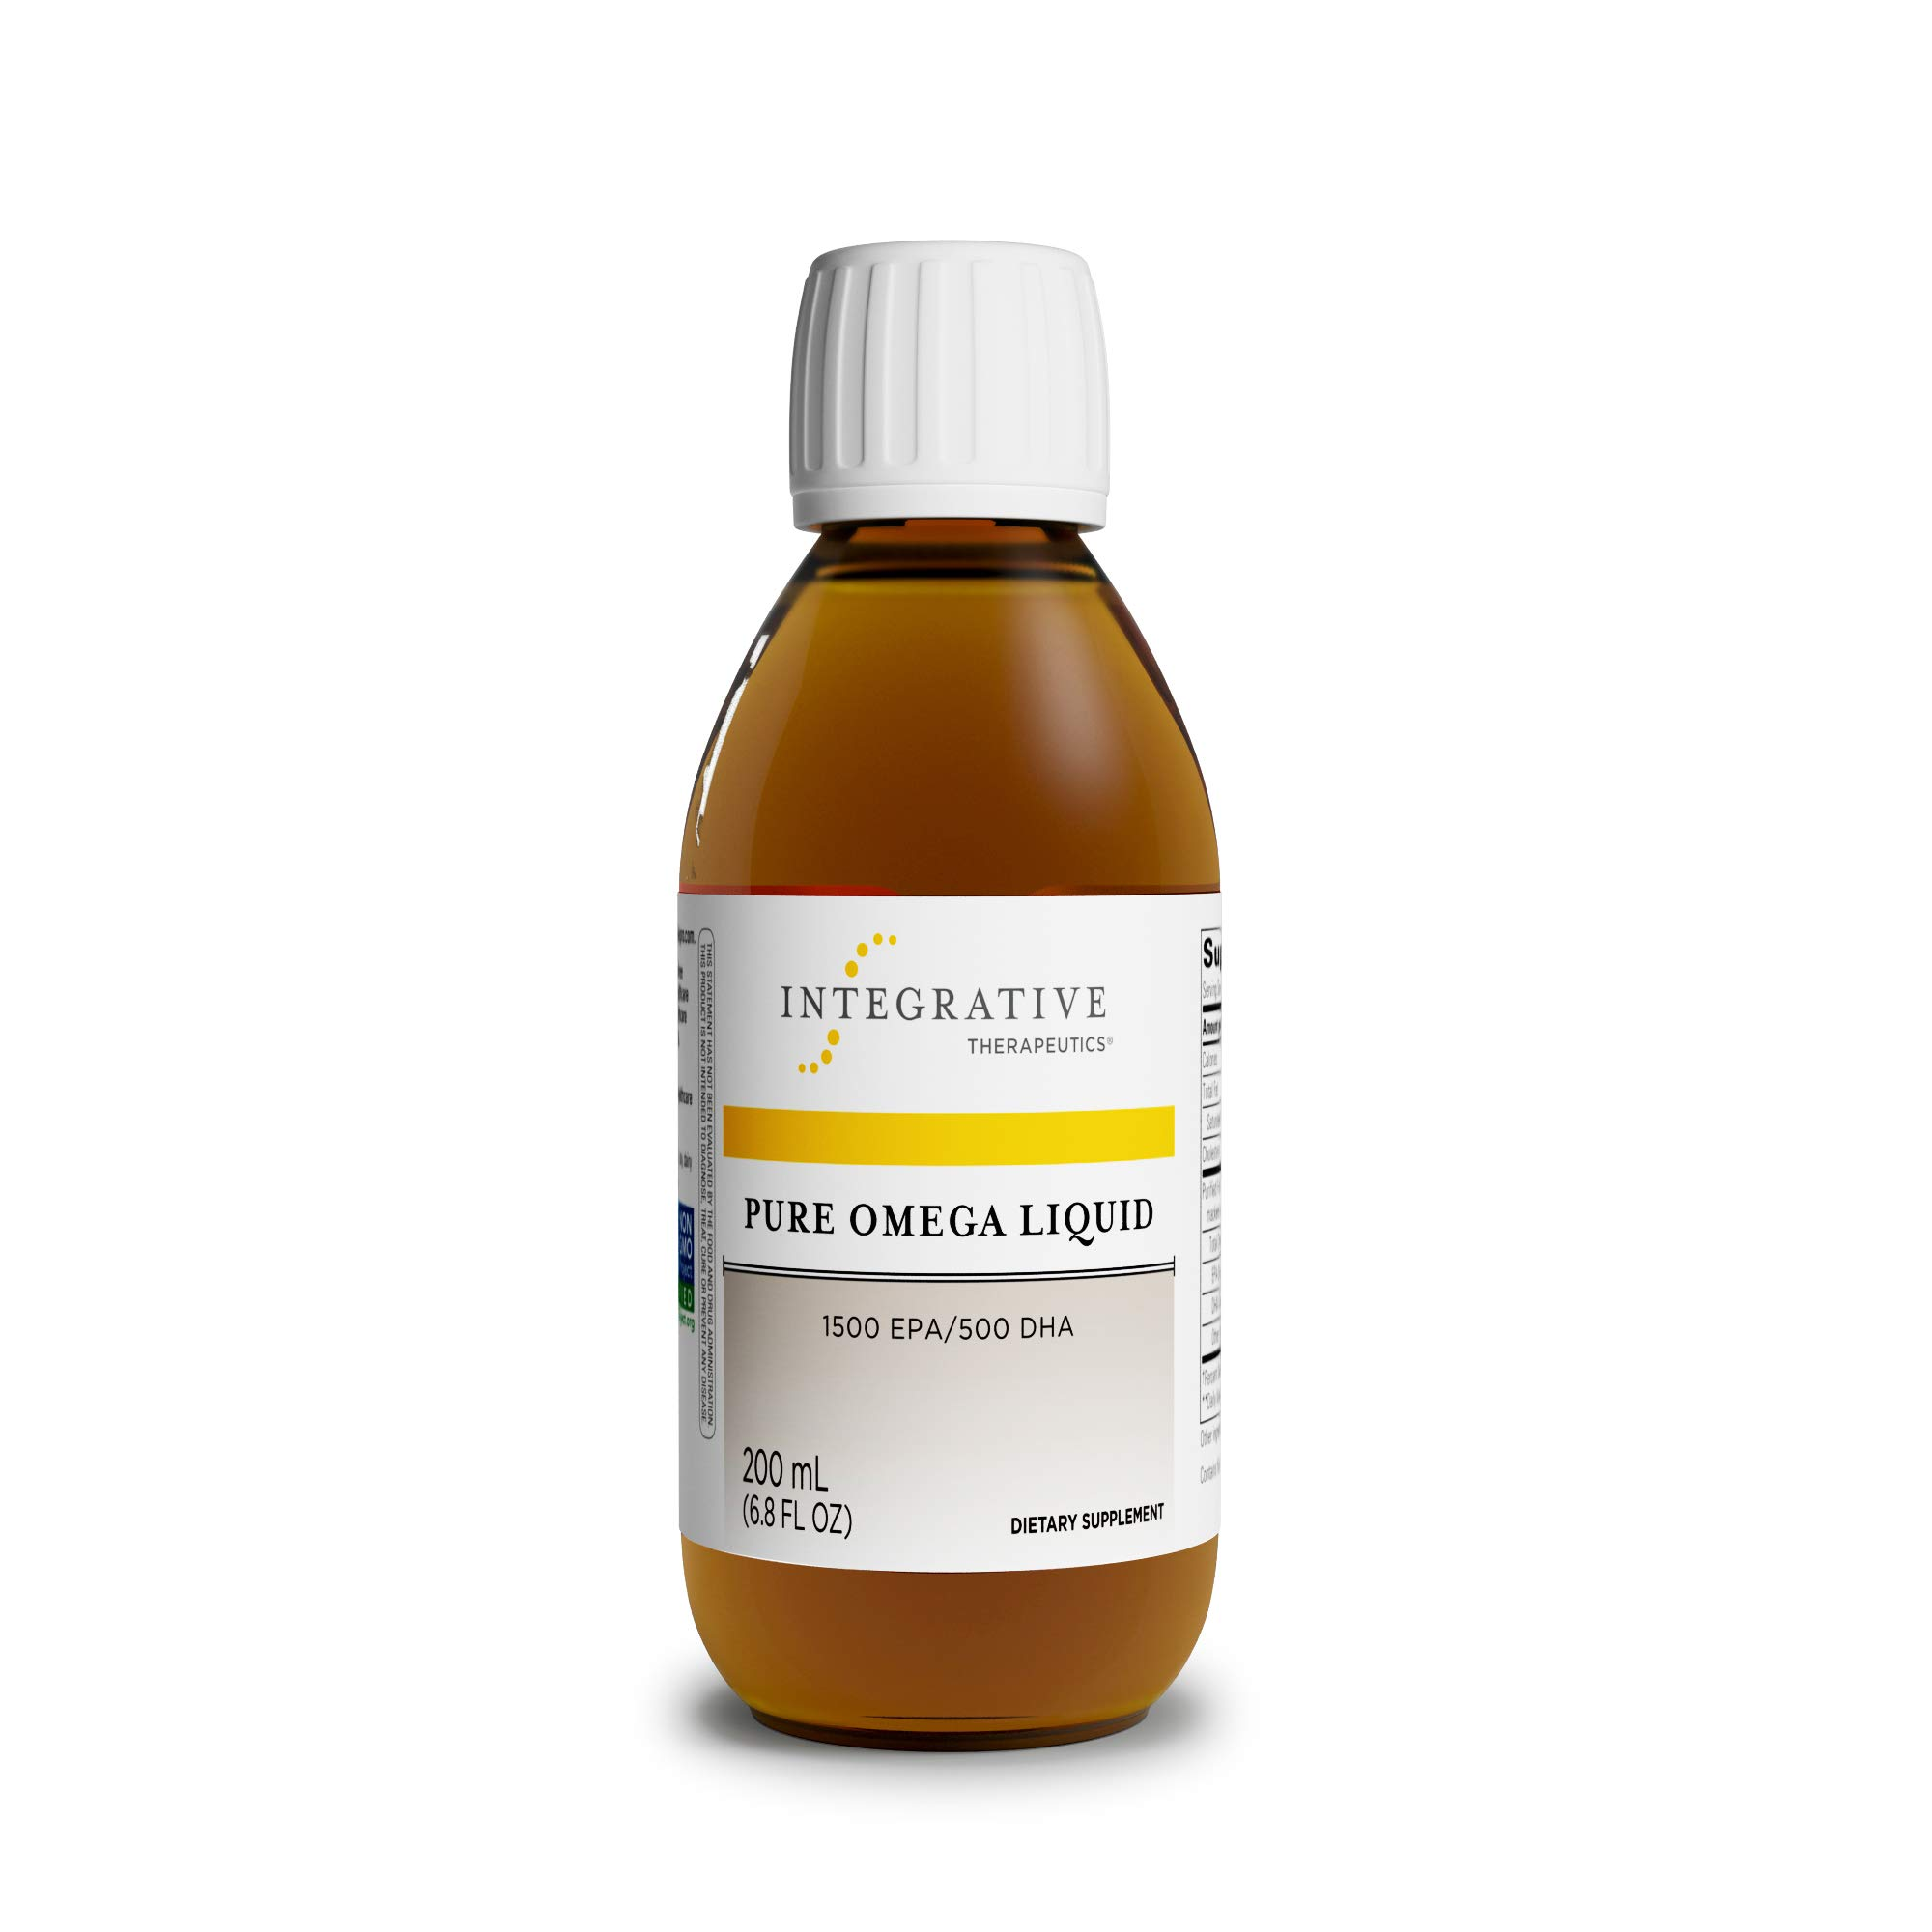 Integrative Therapeutics - Pure Omega Liquid Fish Oil - Natural Lemon Flavor - 2300 mg Omega 3 Fatty Acids with EPA and DHA - Wild Fish Oil - No Fishy Burp Back - 6.8 fl oz by Integrative Therapeutics